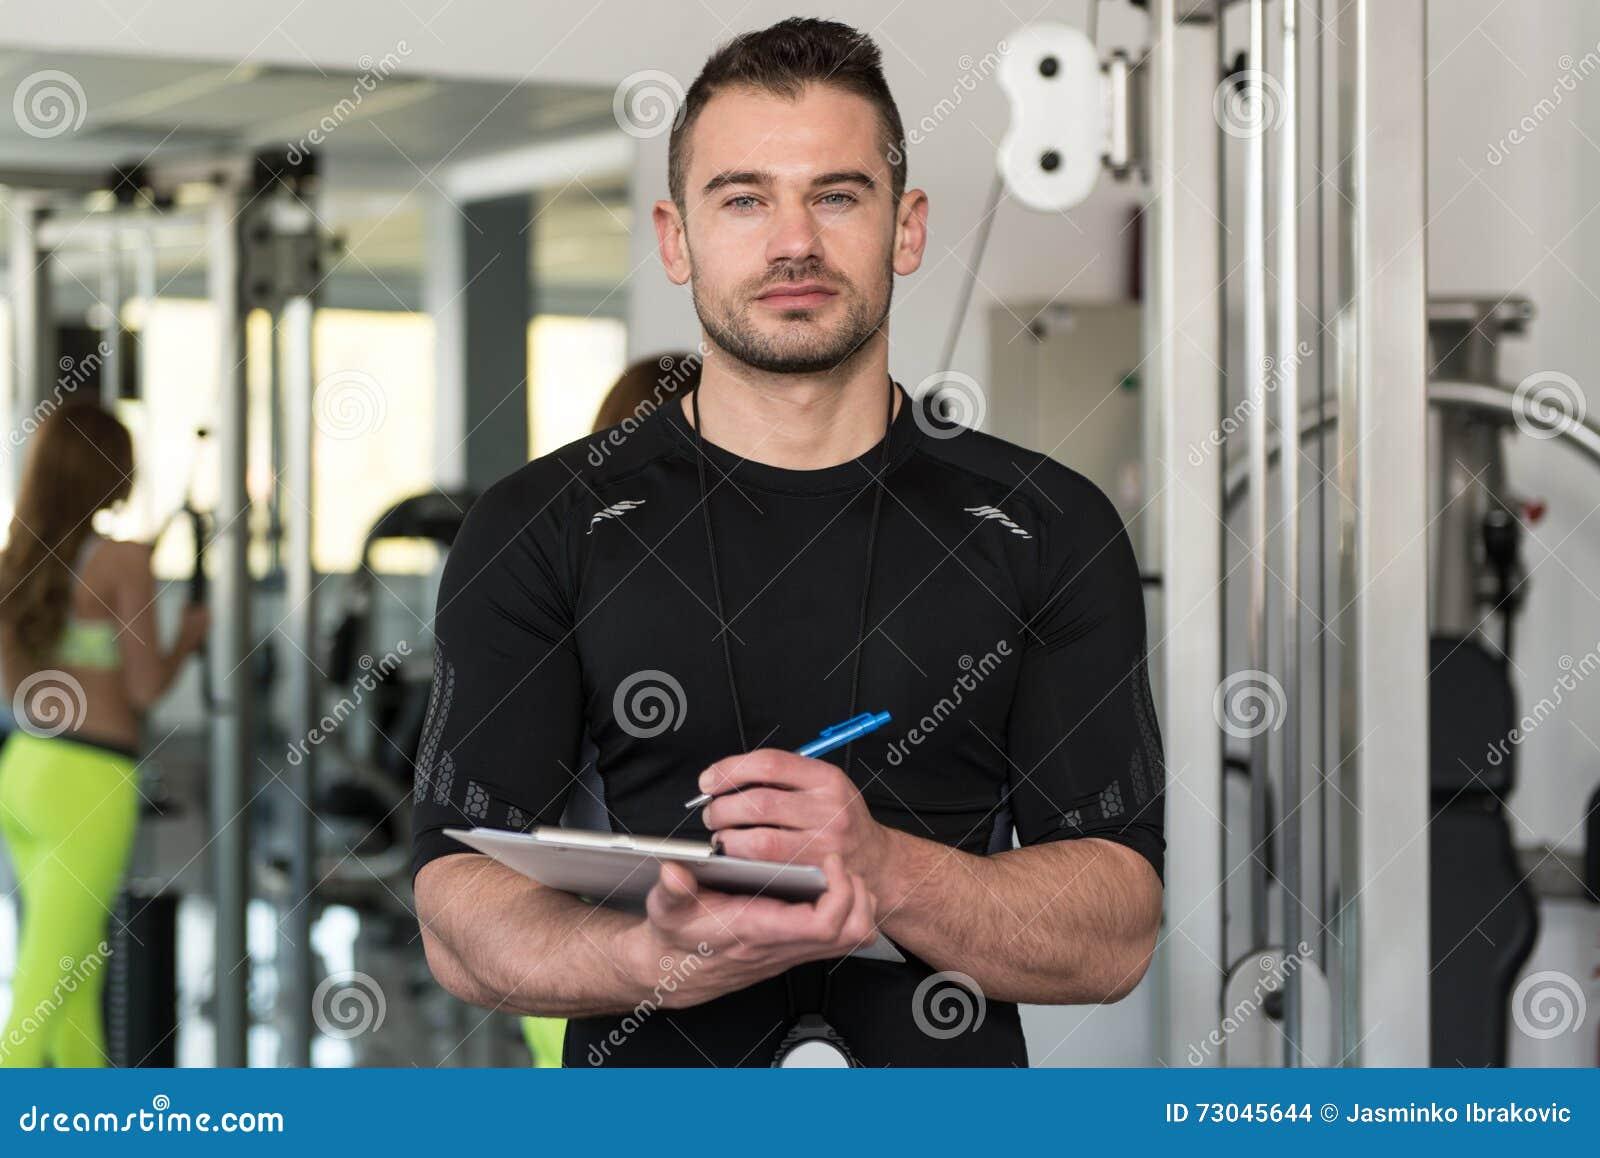 Instructor masculino hermoso With Clipboard In un gimnasio